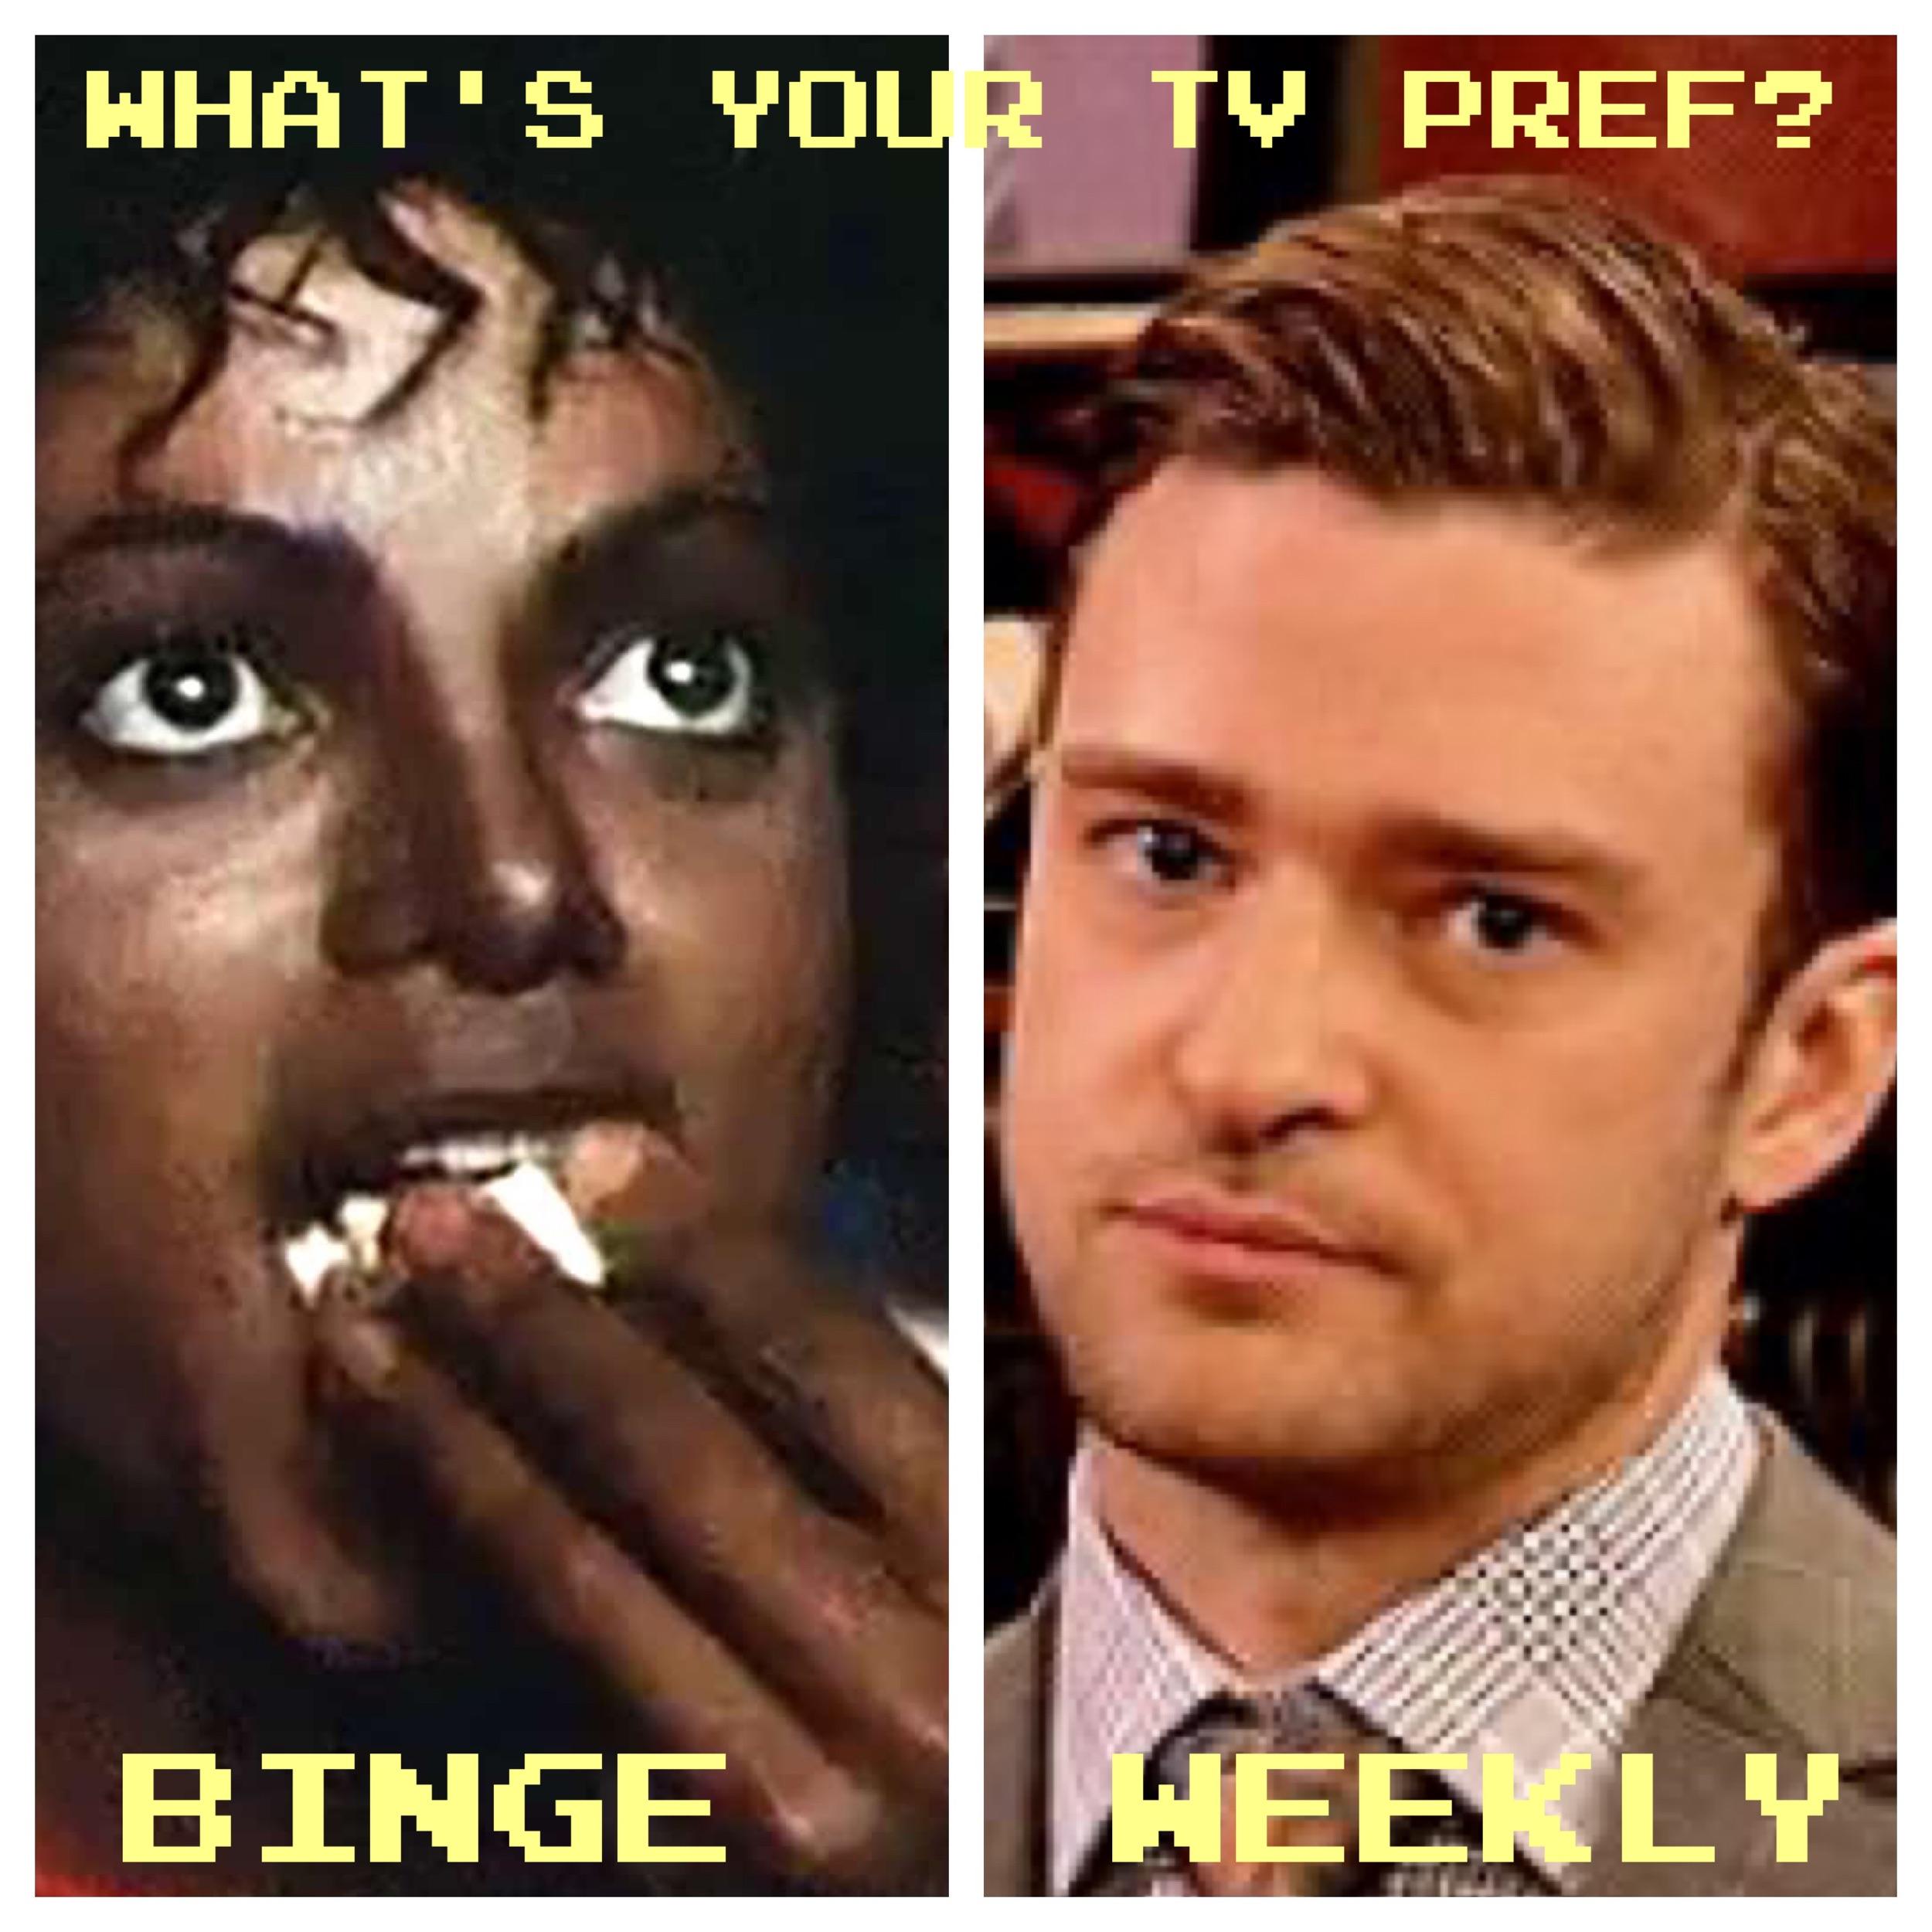 How do you prefer to watch TV shows?